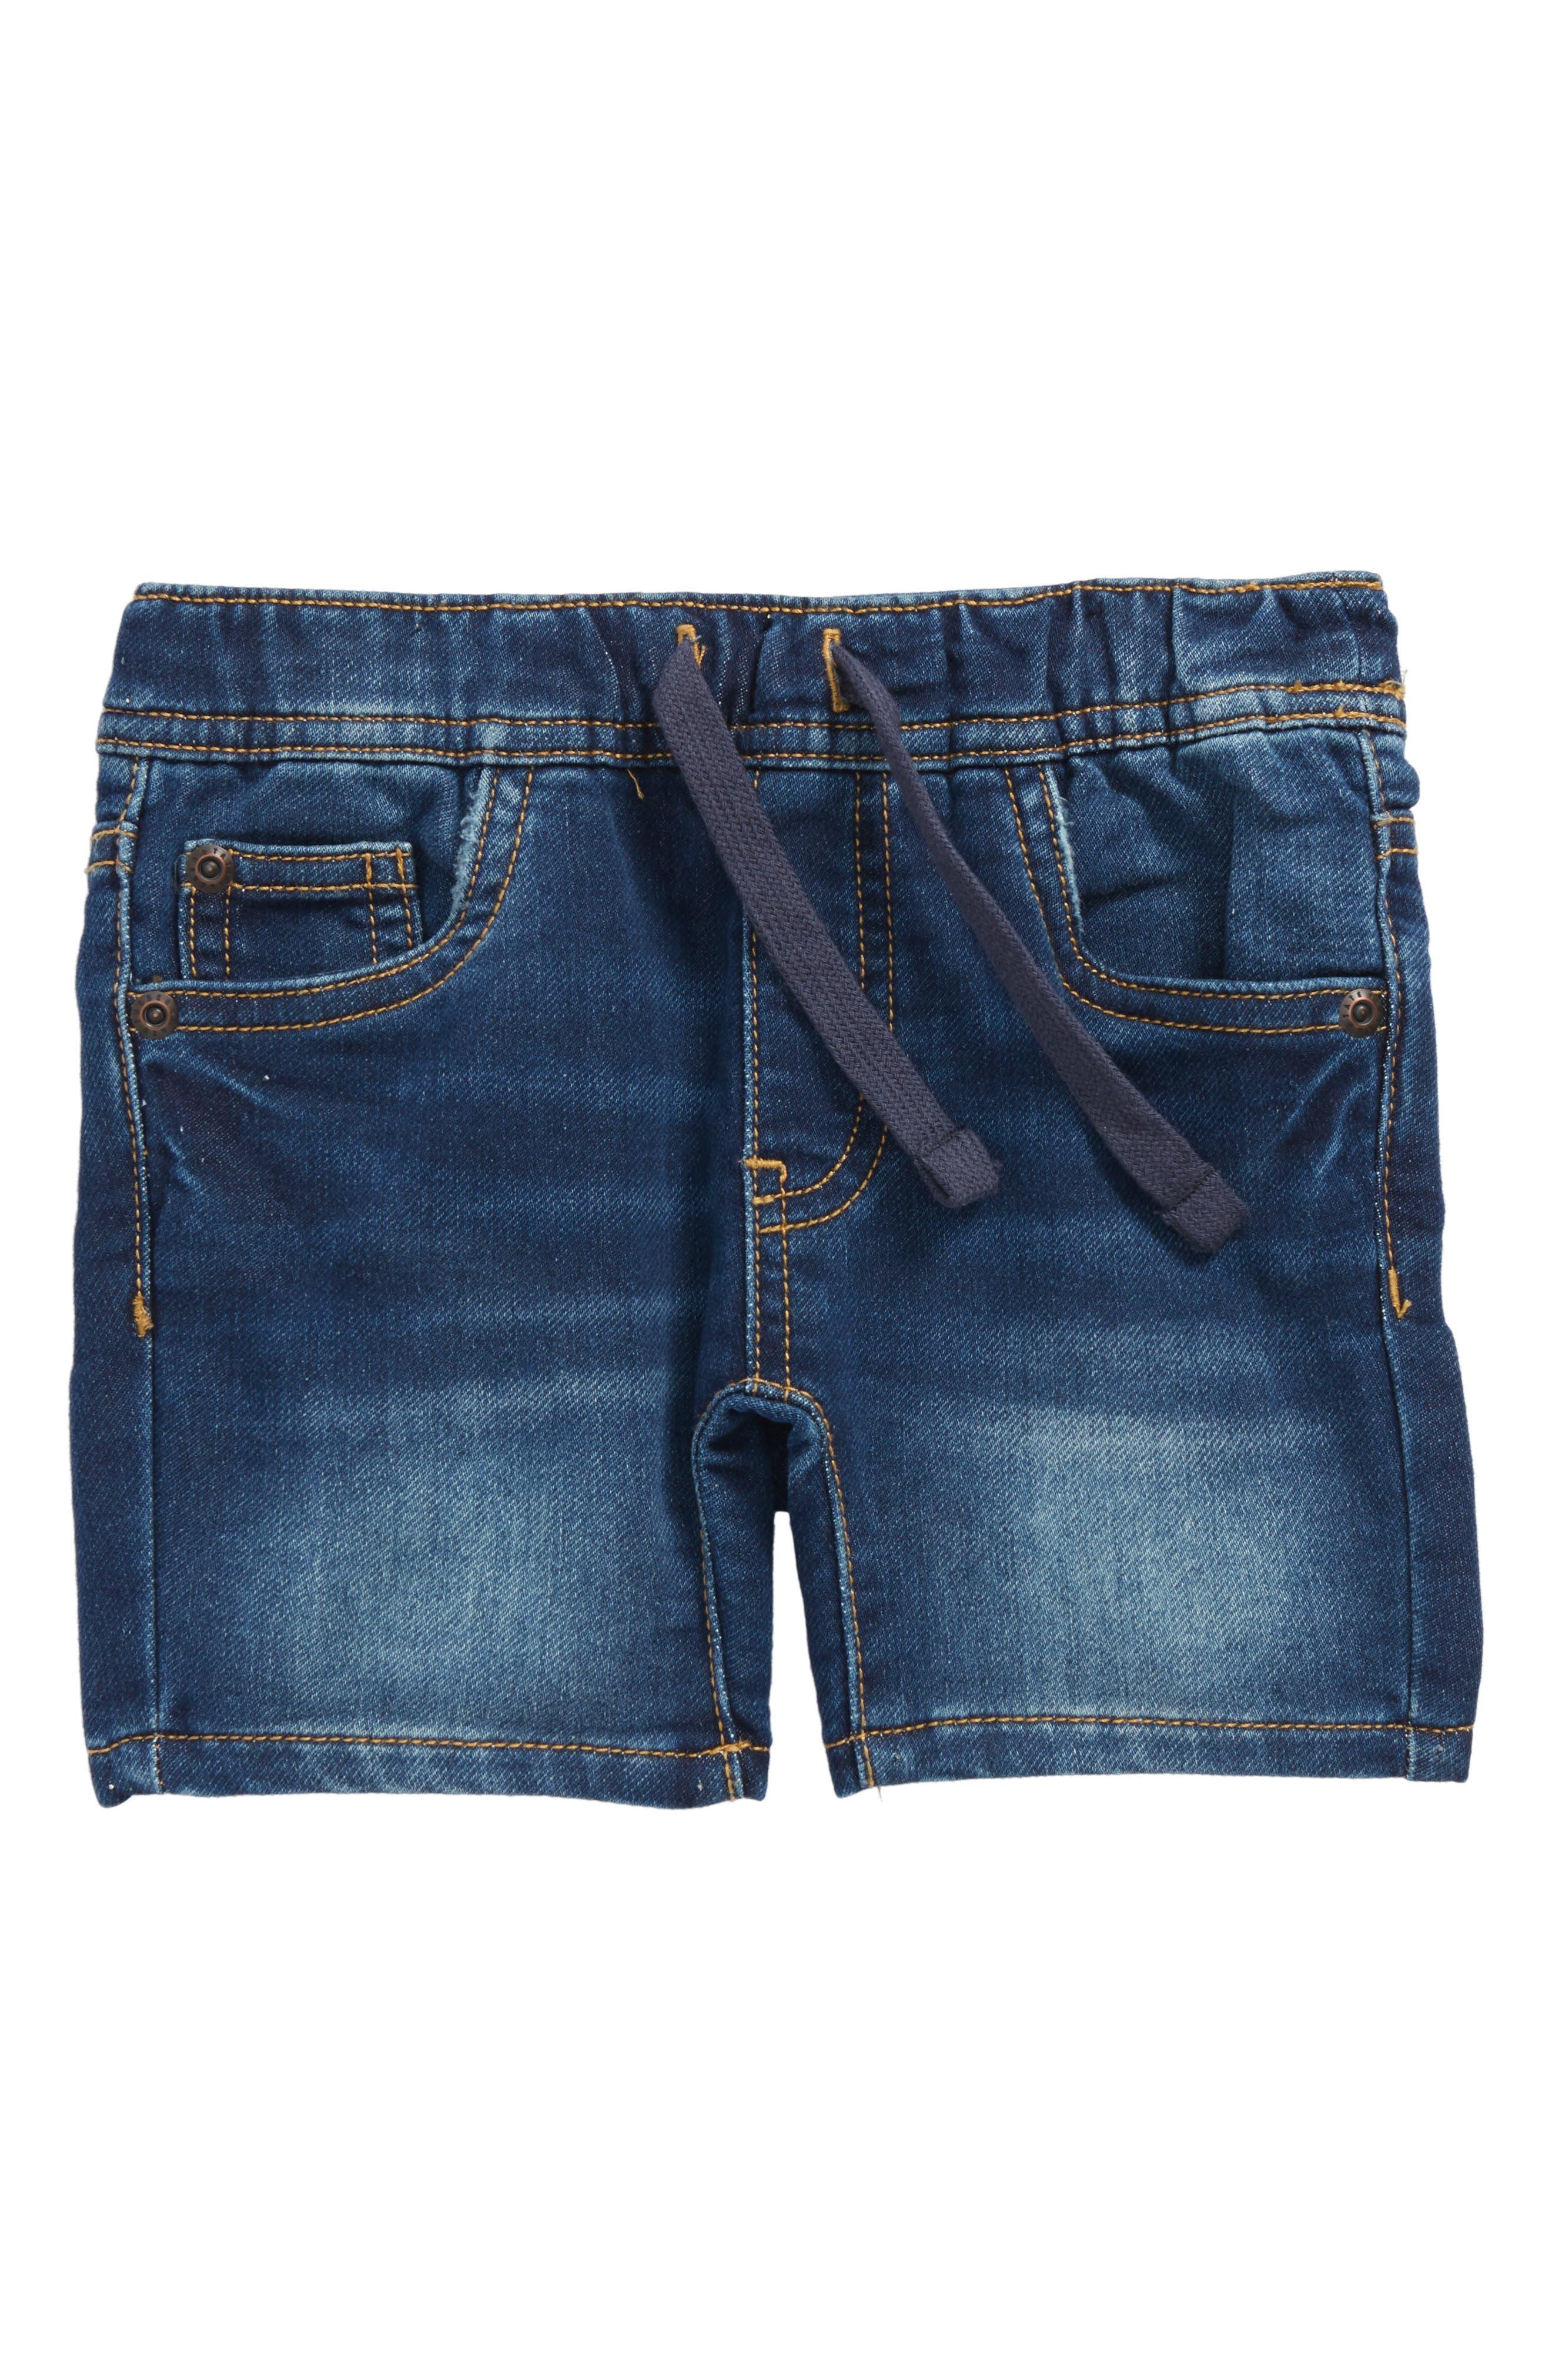 TUCKER + TATE Denim Shorts, Main, color, 400